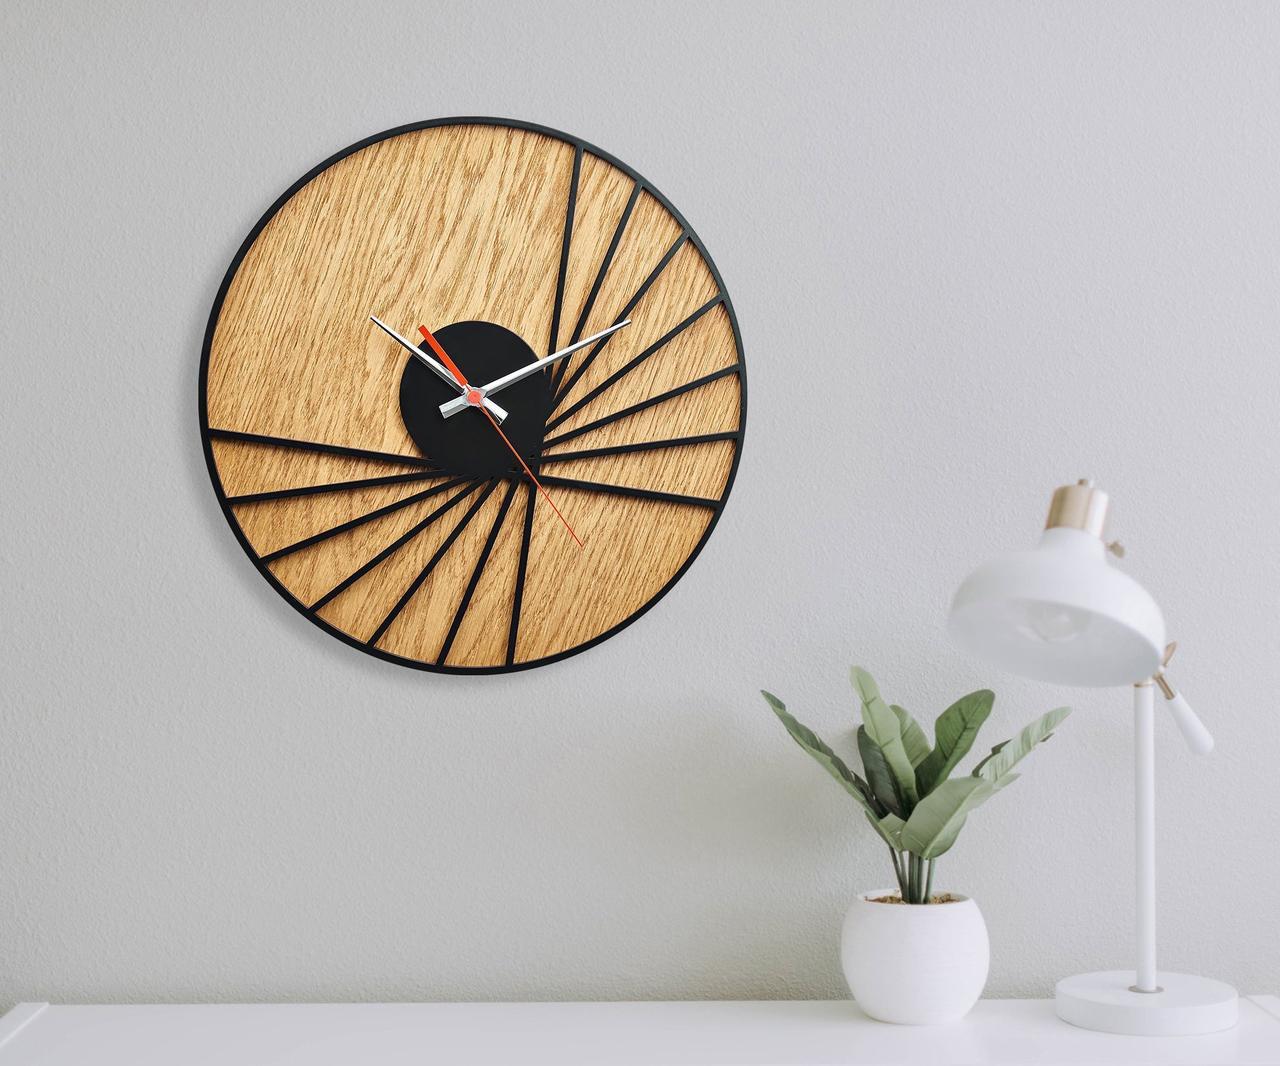 Деревянные настенные часы Moku Takayama